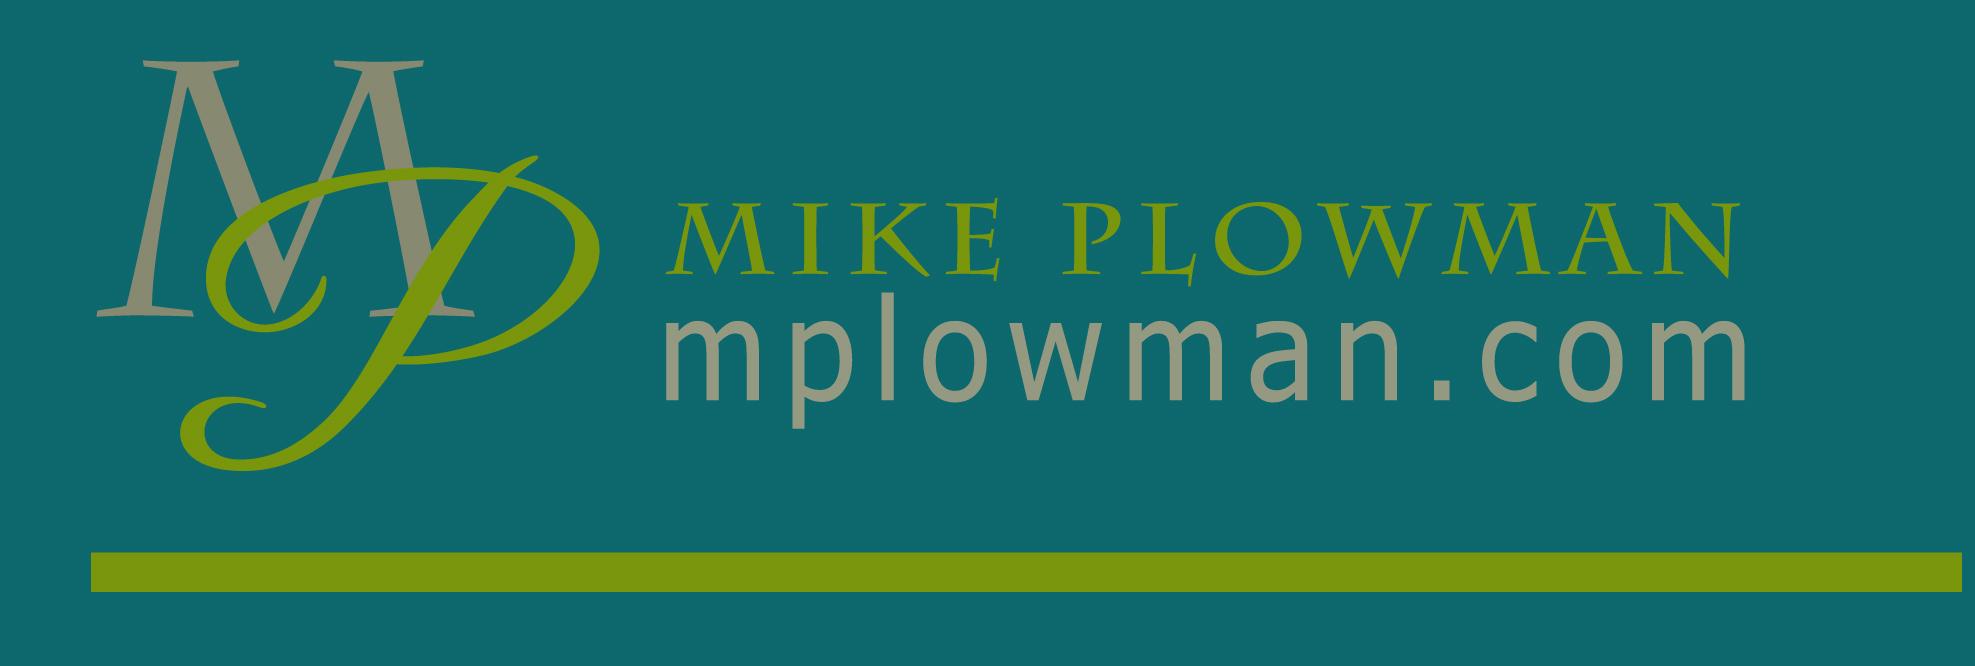 MikePlowman.com